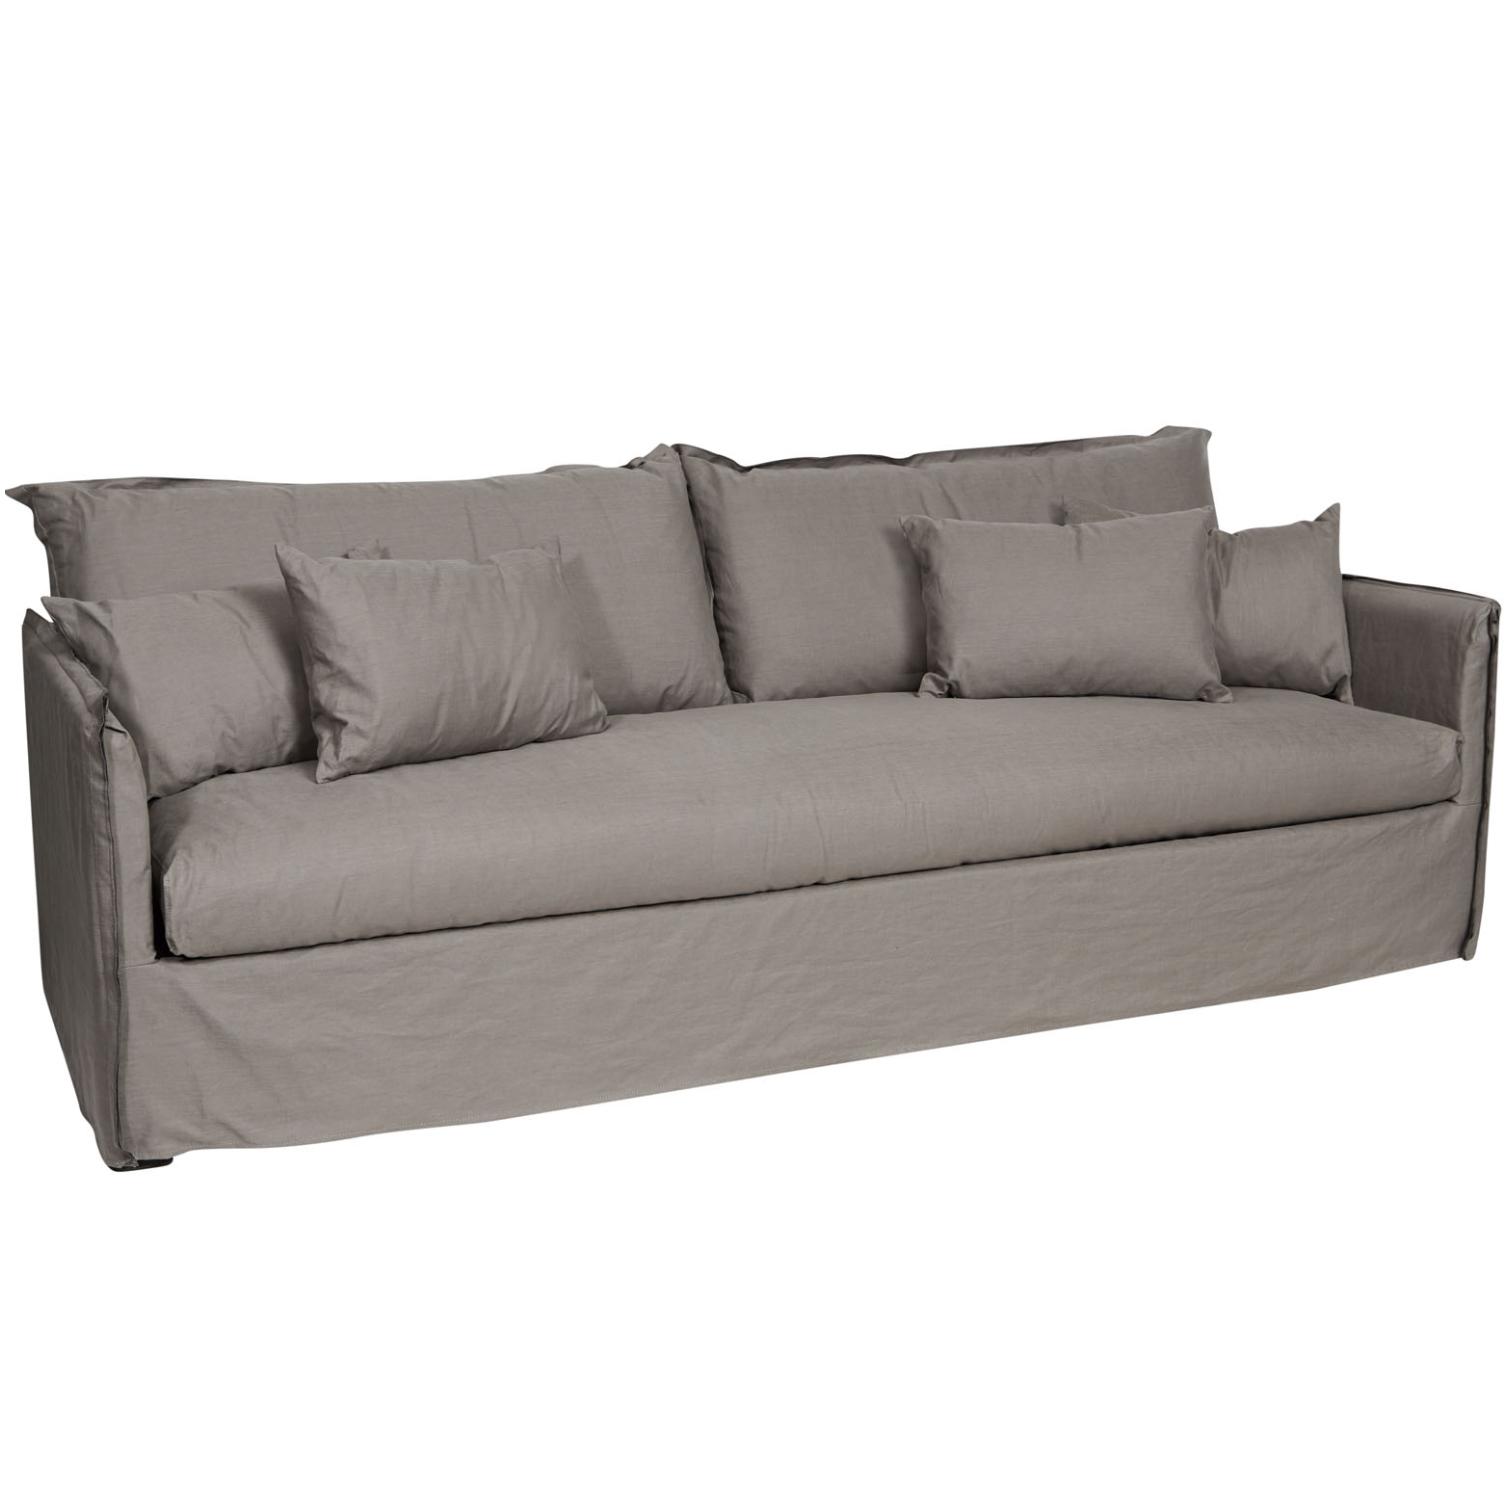 crew bungalow 3.5 seater sofa -